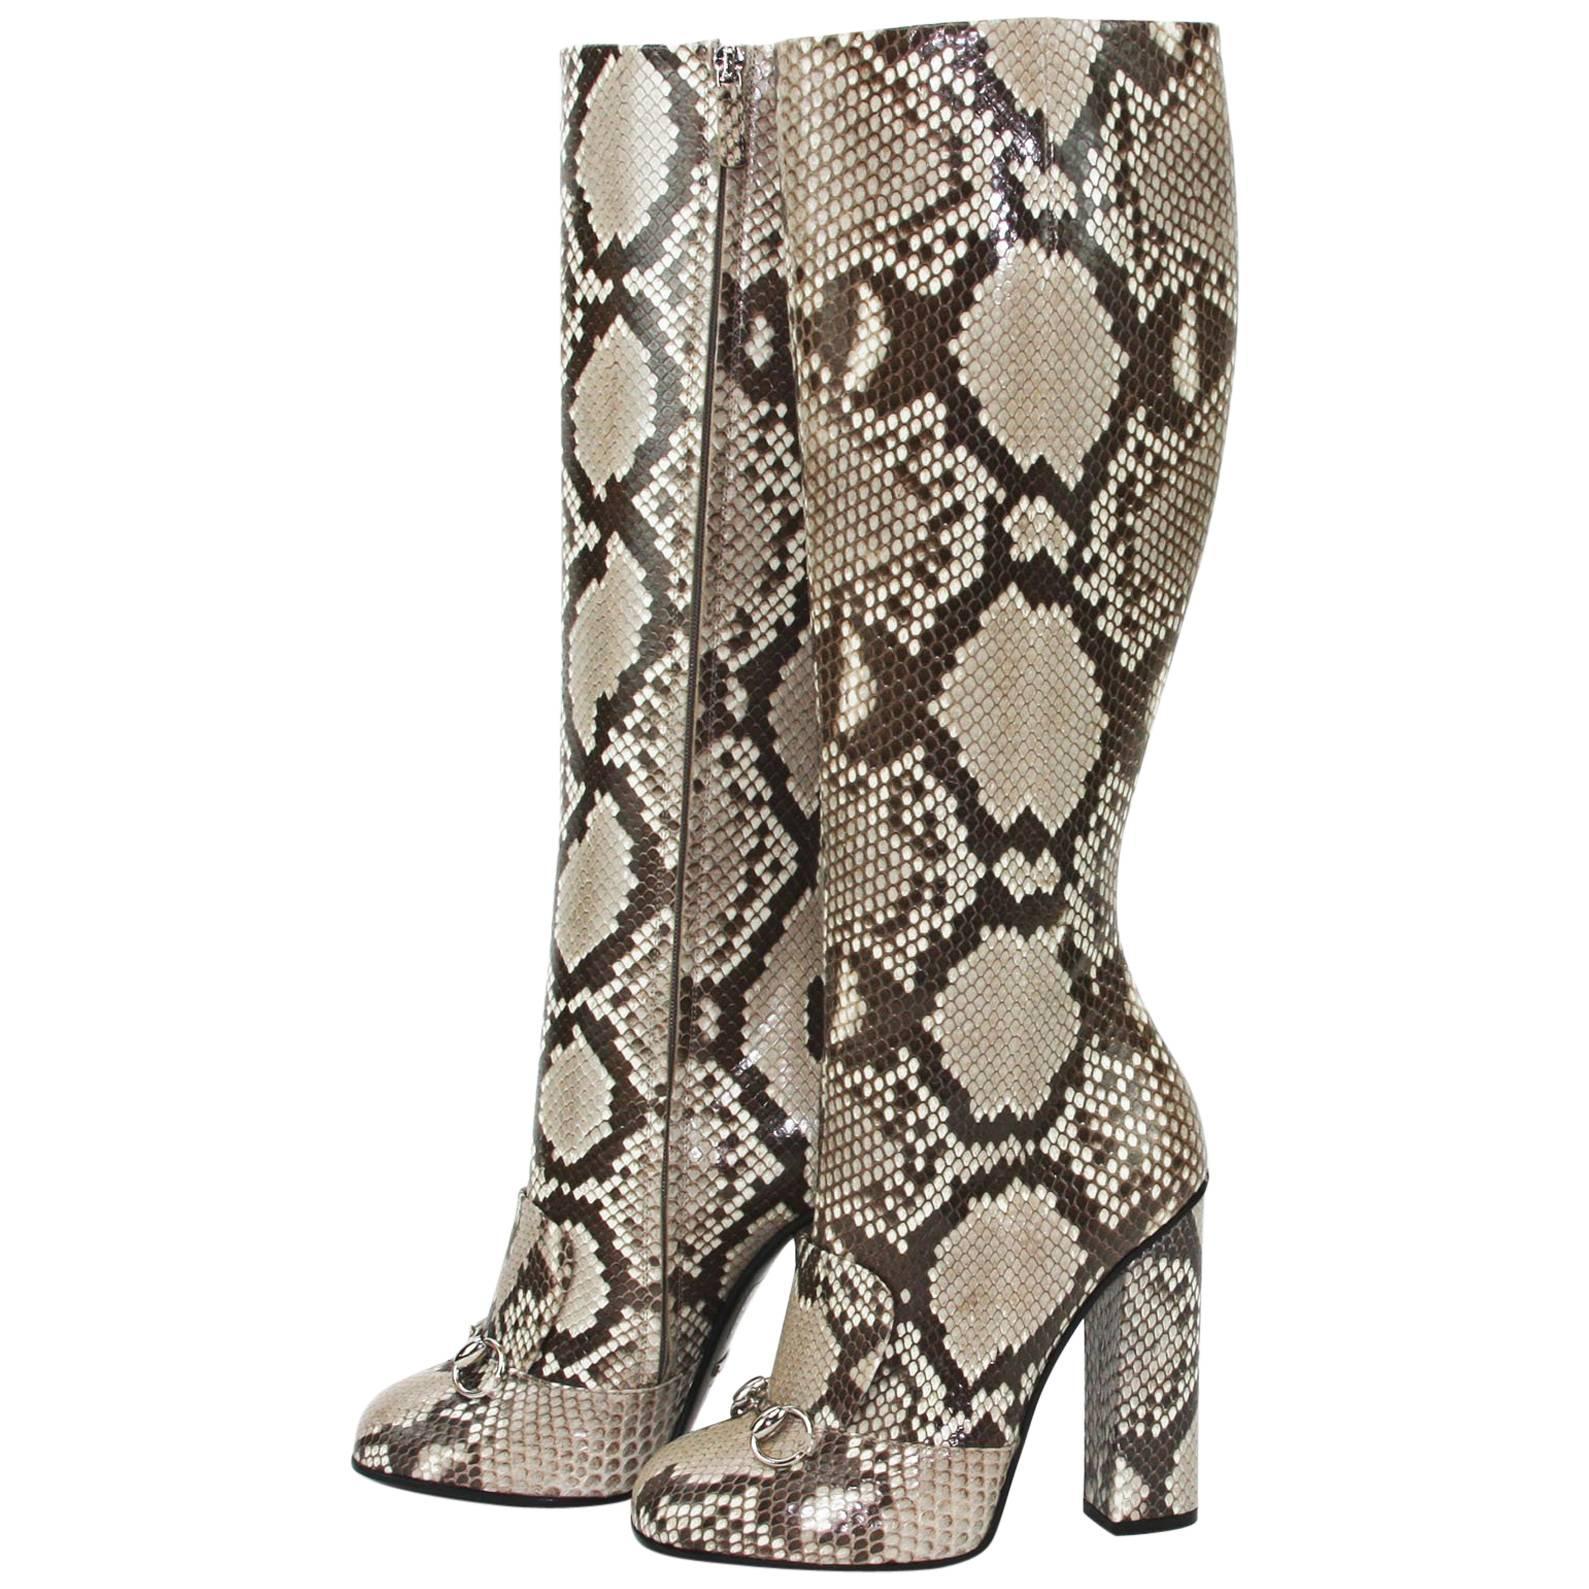 7a38752c53d New GUCCI Campaign $3500 Python Horsebit High Boots Beige Brown It 37 - US  37.5